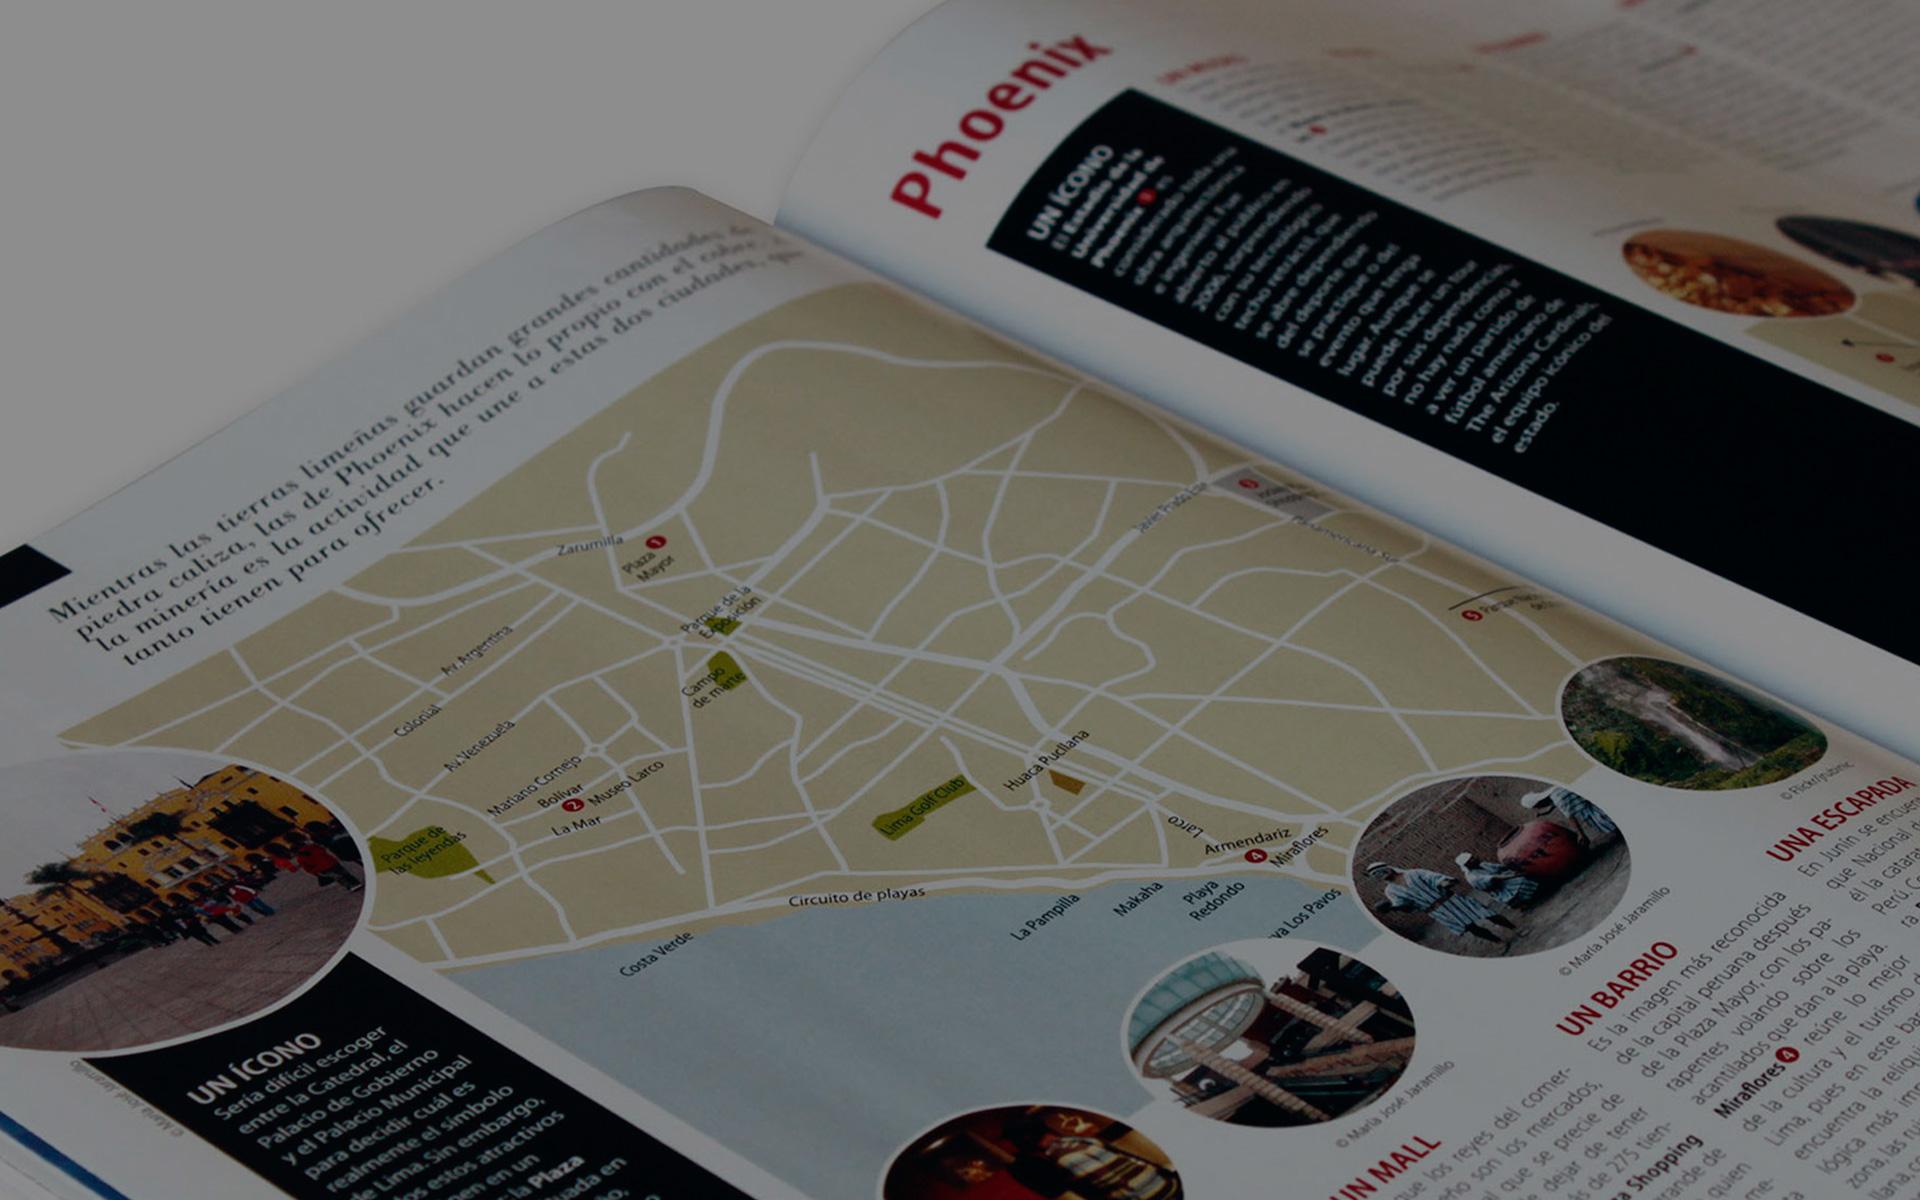 Expresa dise o gr fico editorial for Diseno grafico editorial